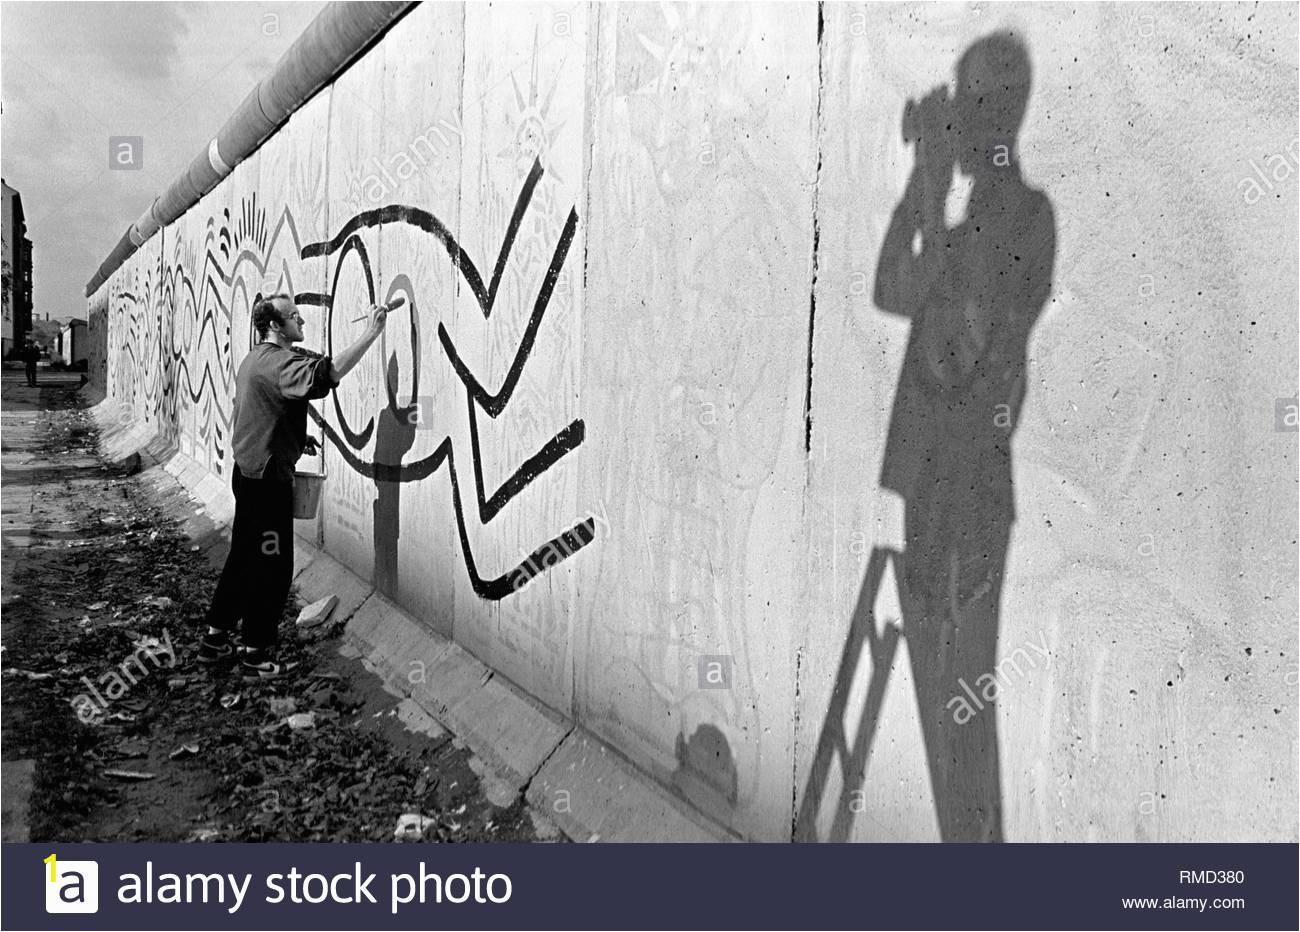 Berlin Wall Mural Keith Haring Keith Haring Stockfotos & Keith Haring Bilder Seite 2 Alamy